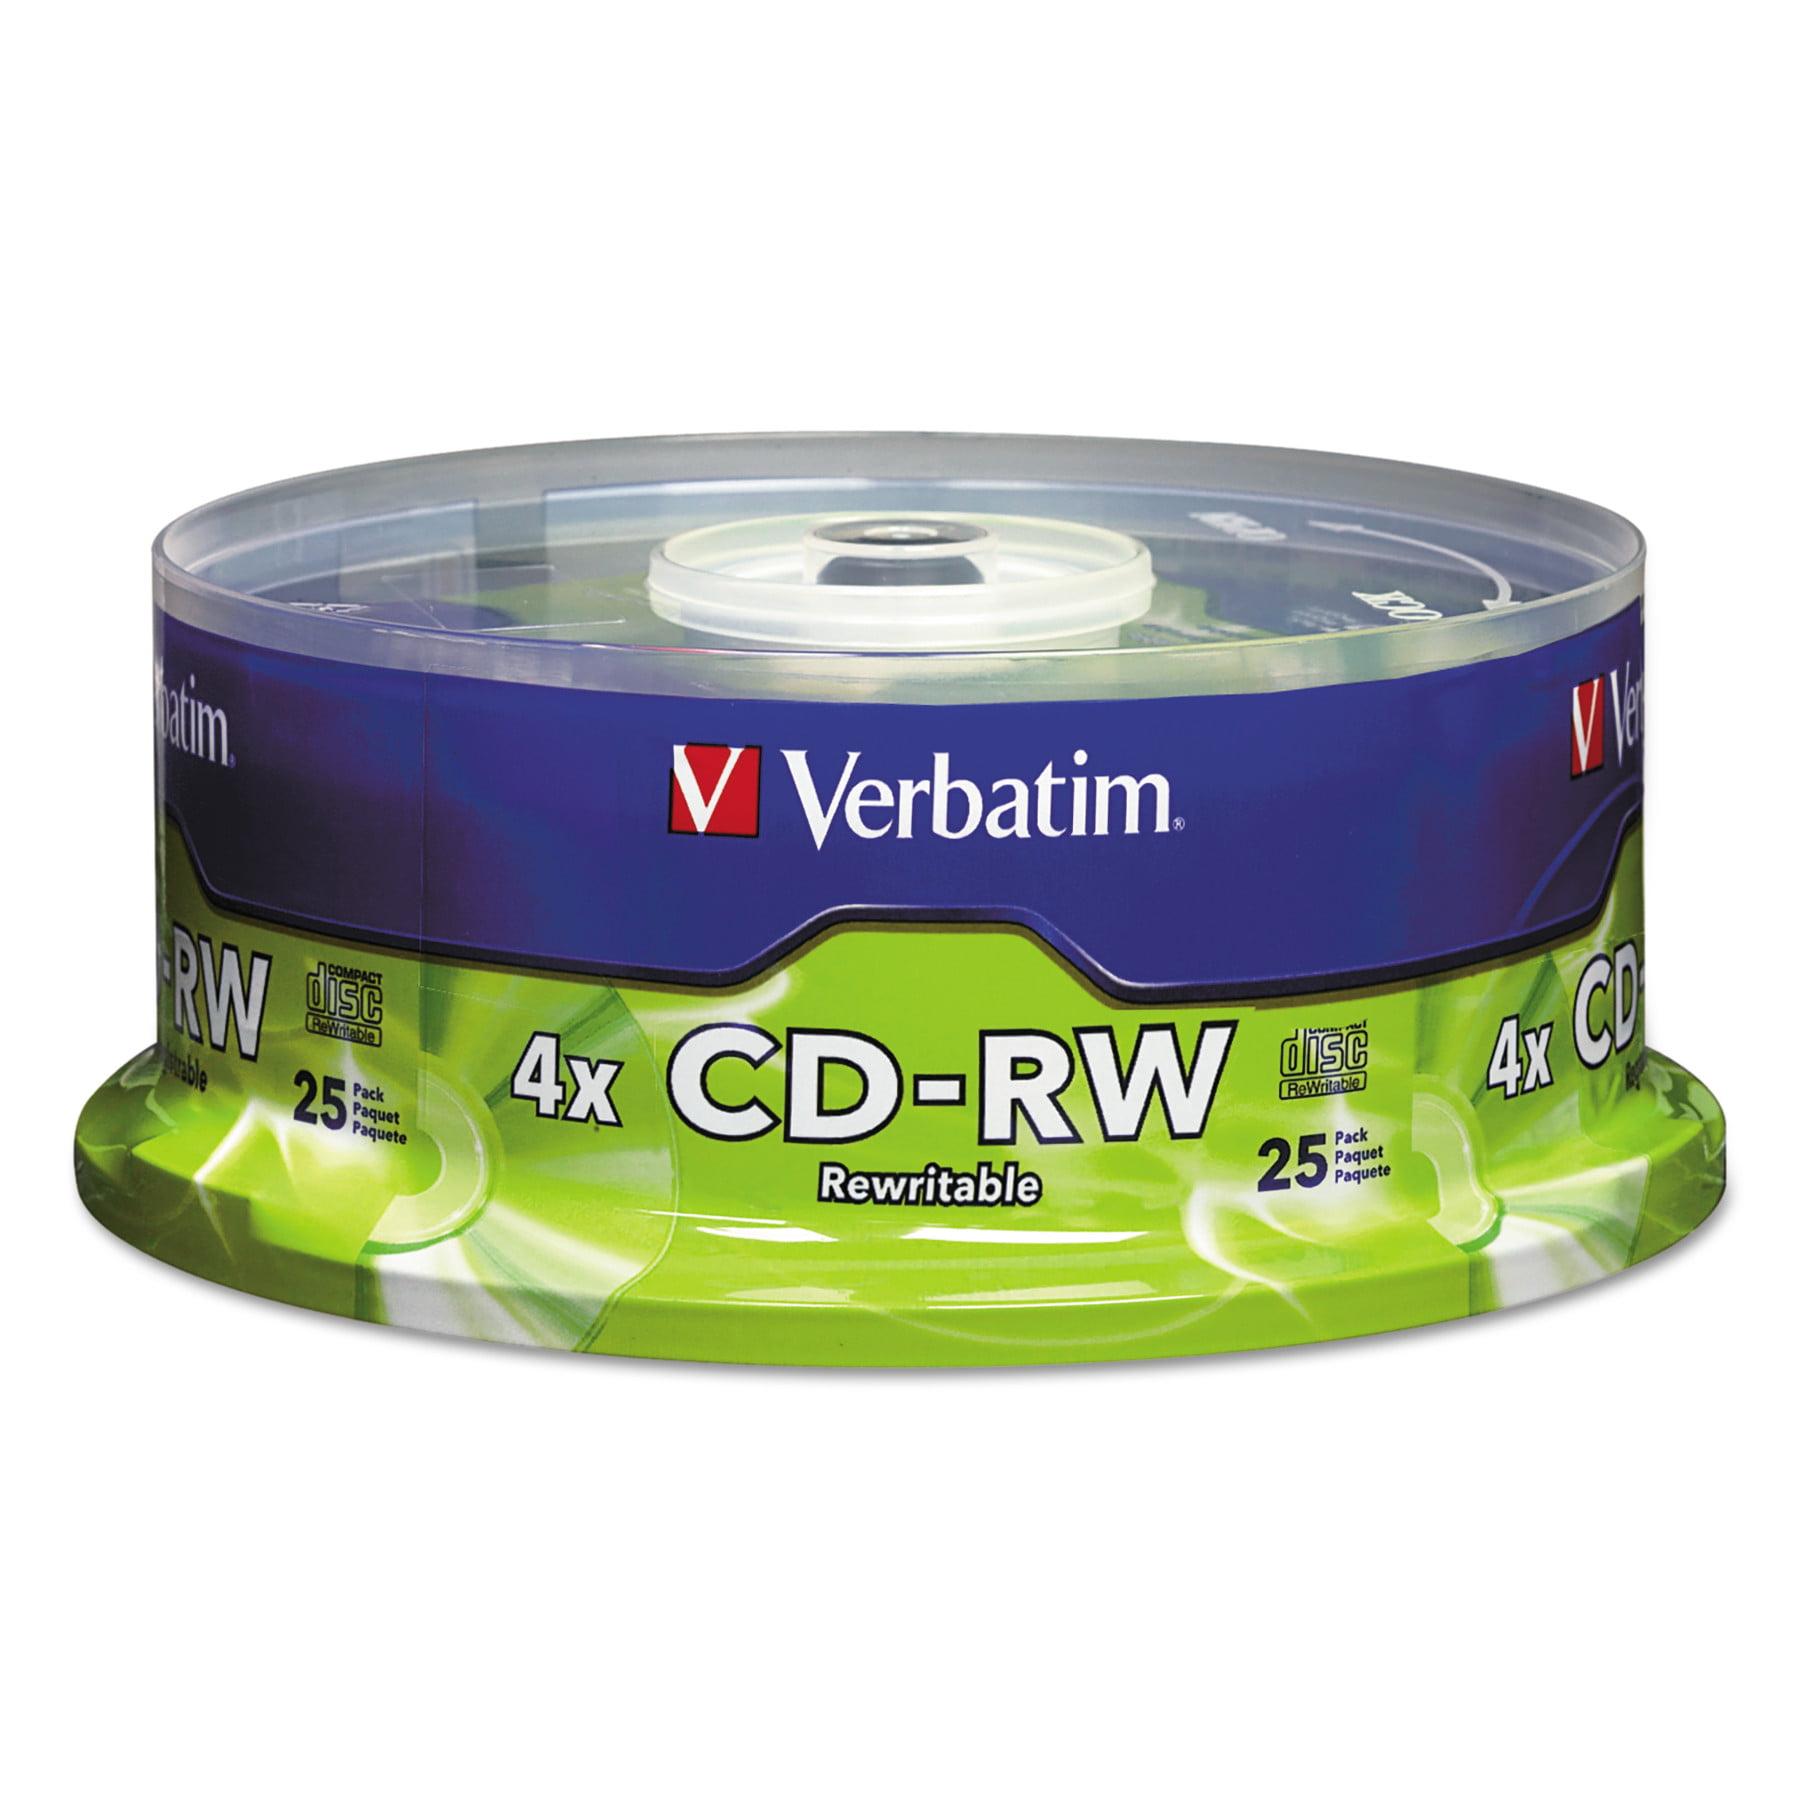 Verbatim CD-RW Discs, 700MB/80min, 4X, Spindle, Matte Silver, 25/Pack